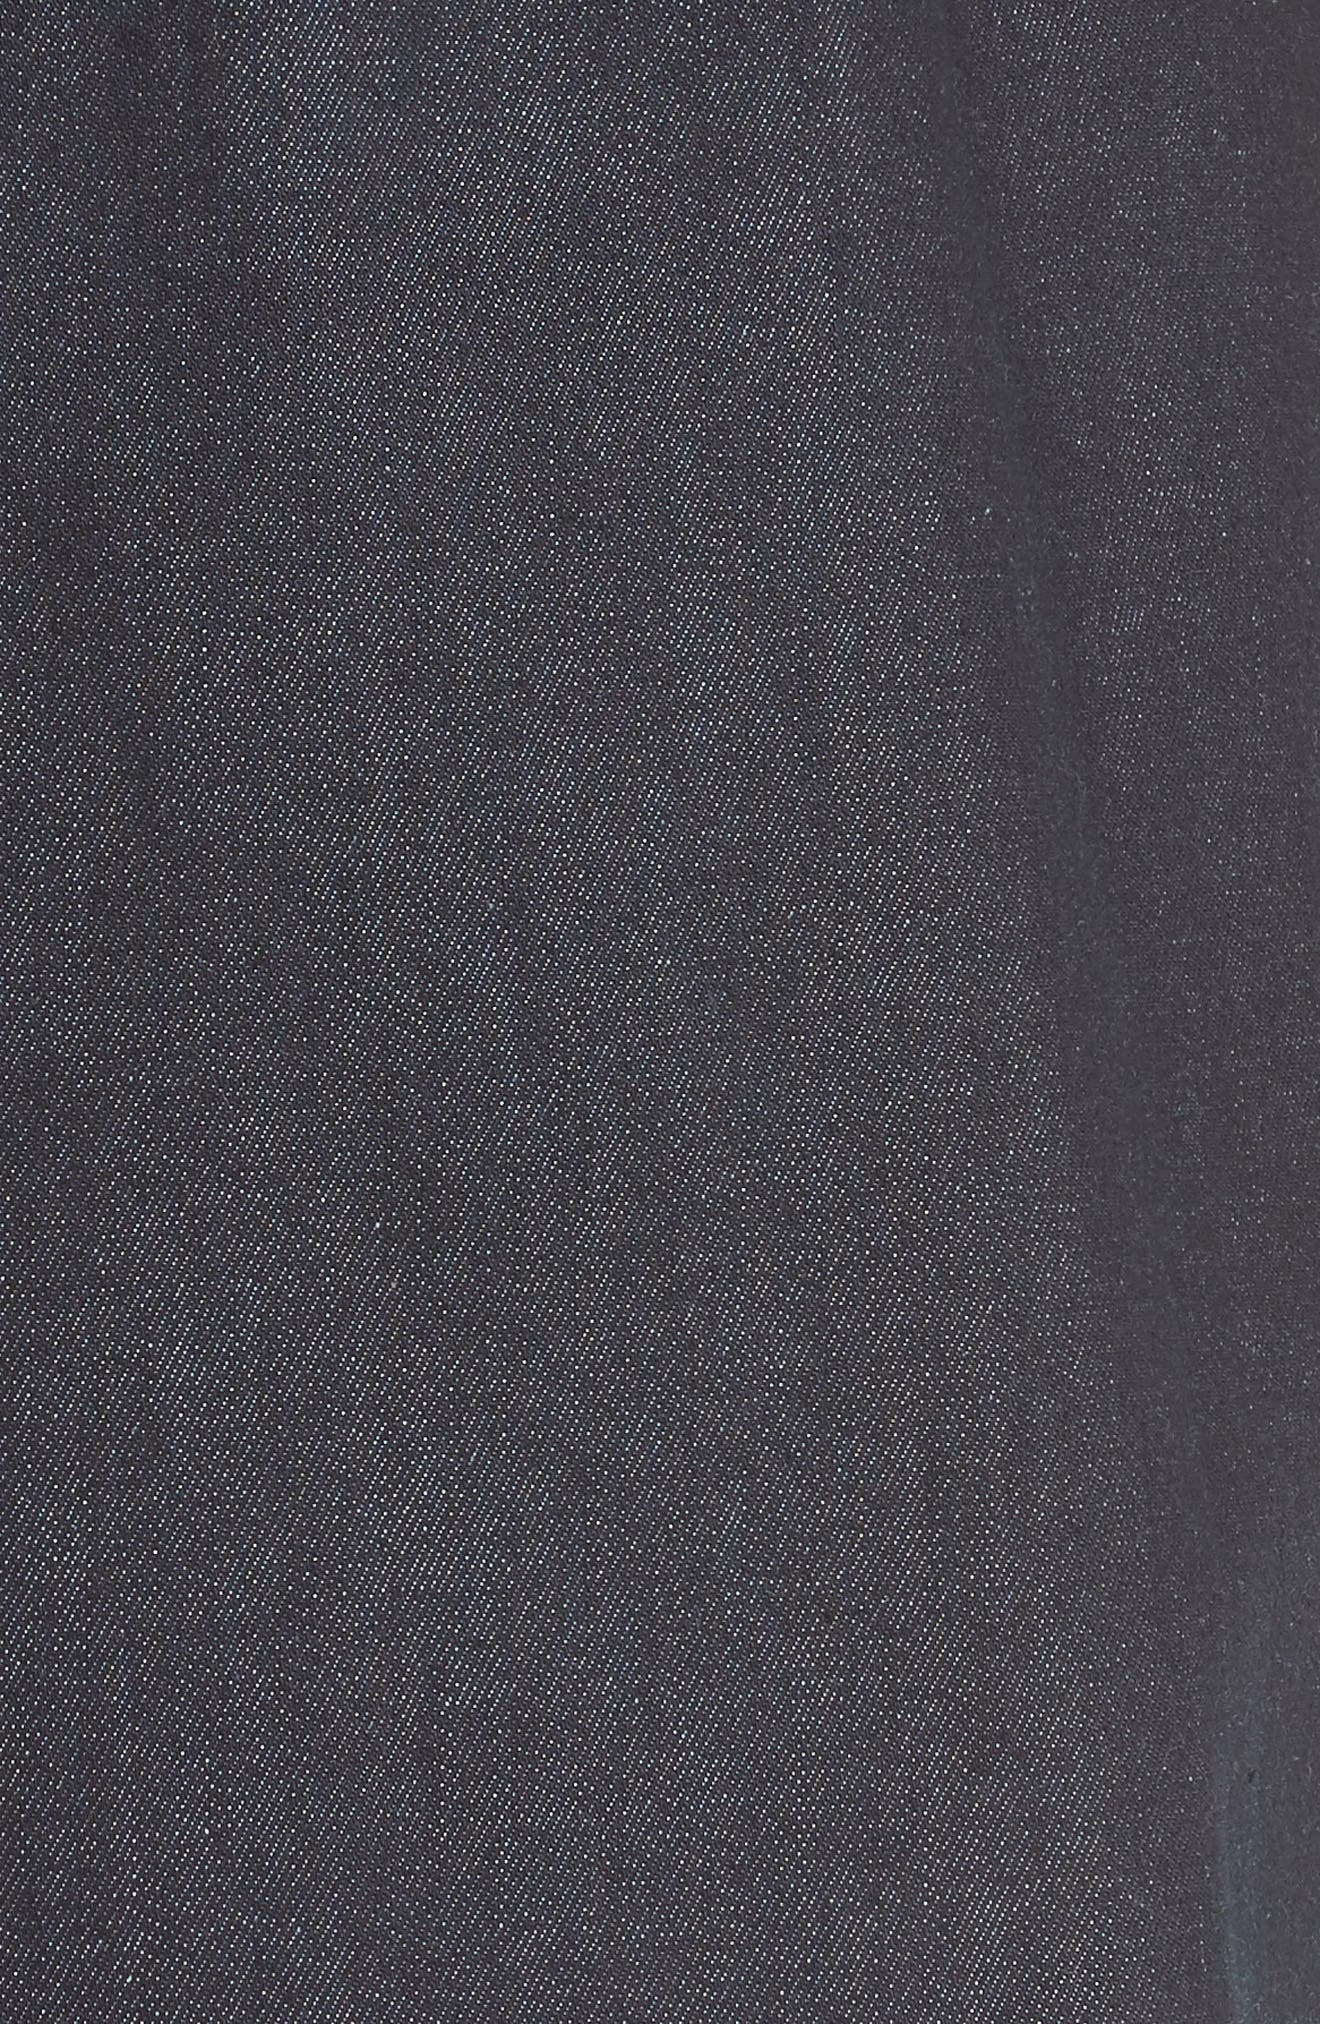 rivet detail denim fit & flare dress,                             Alternate thumbnail 5, color,                             INDIGO